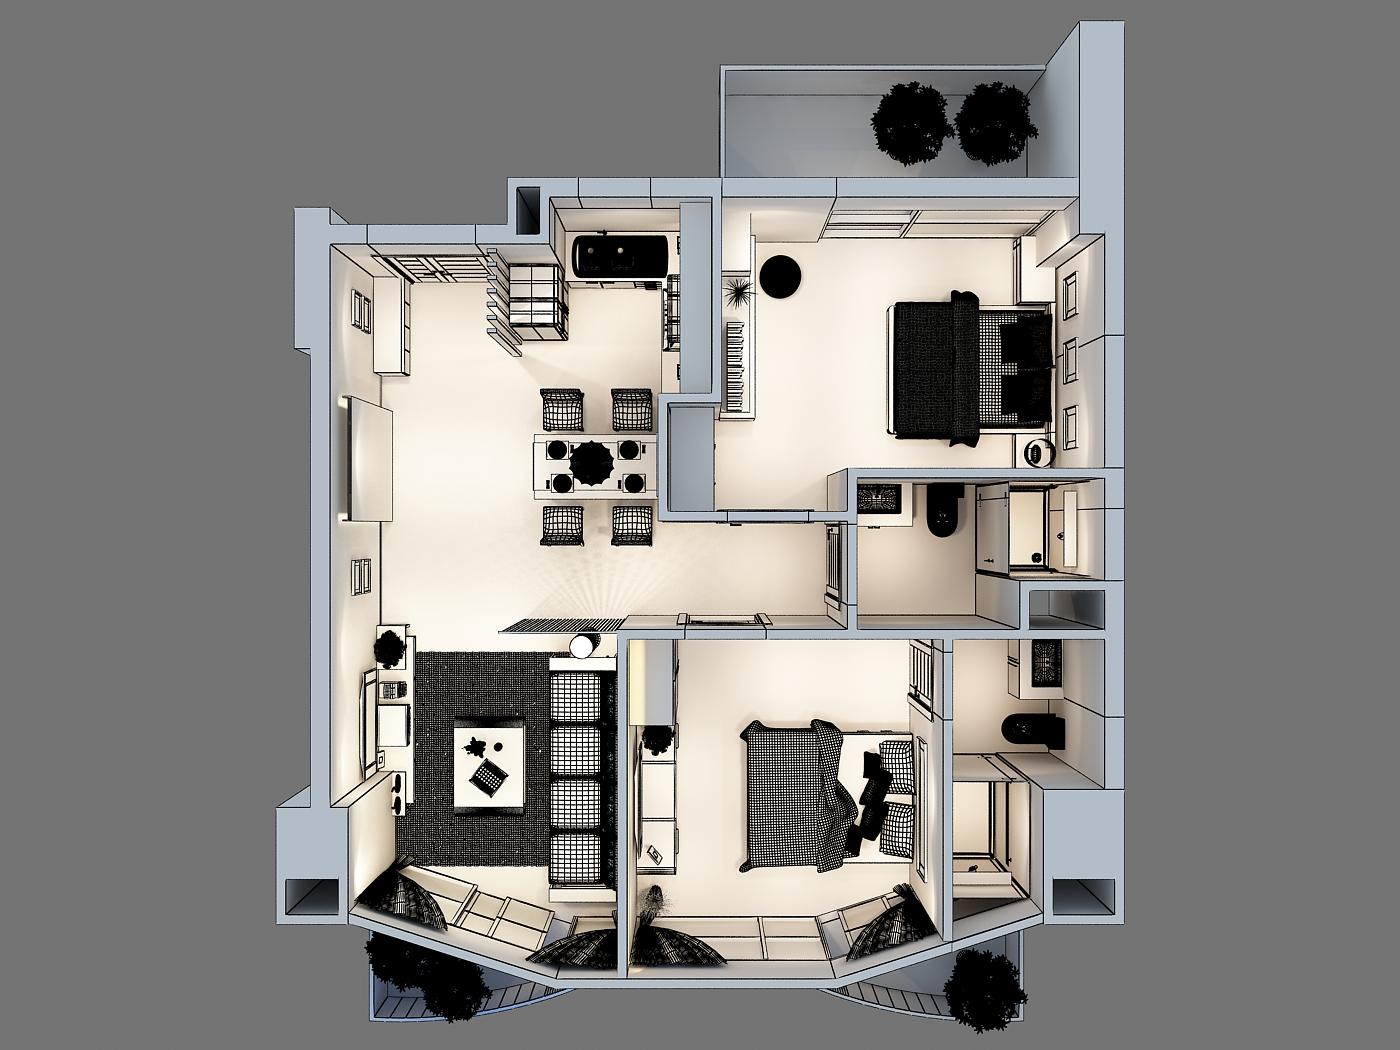 3d model detailed interior apartment 3d model for Com apartment model